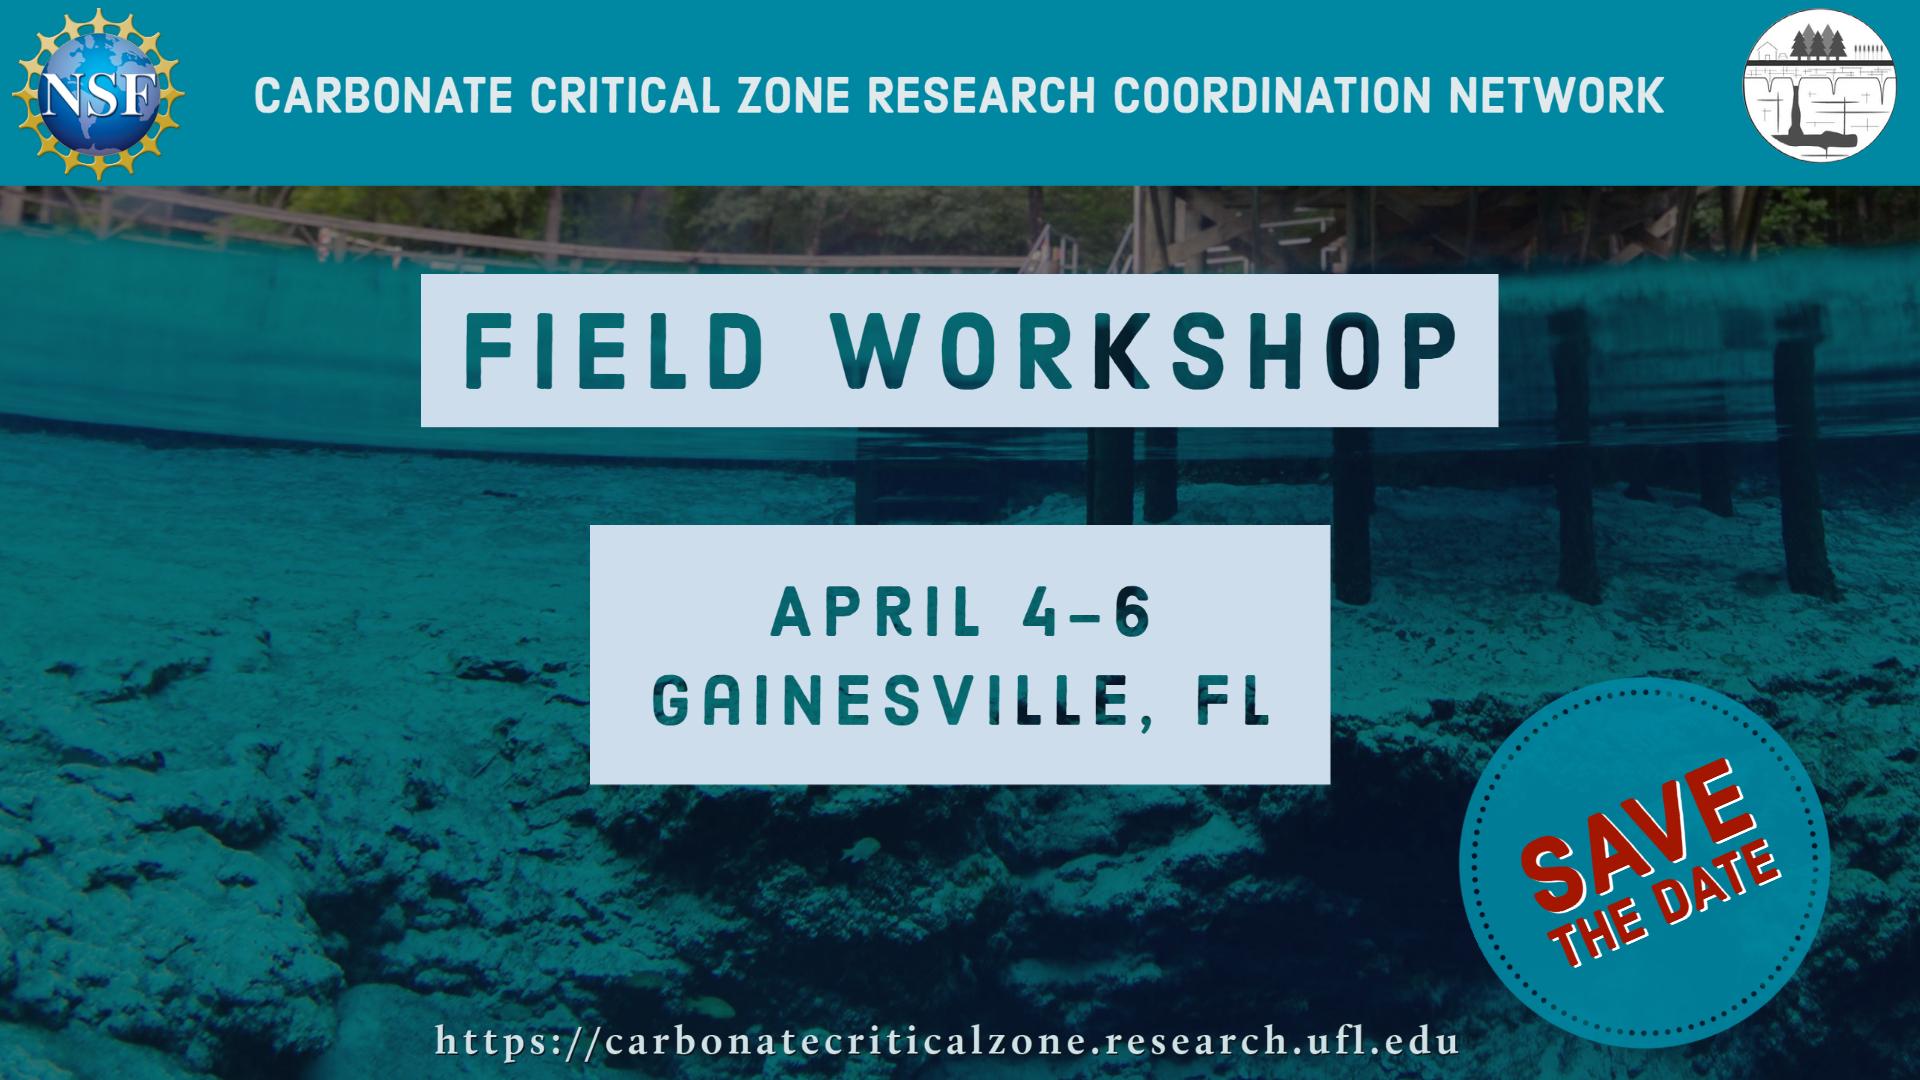 Field Workshop, April 4-6, Gainesville, Florida